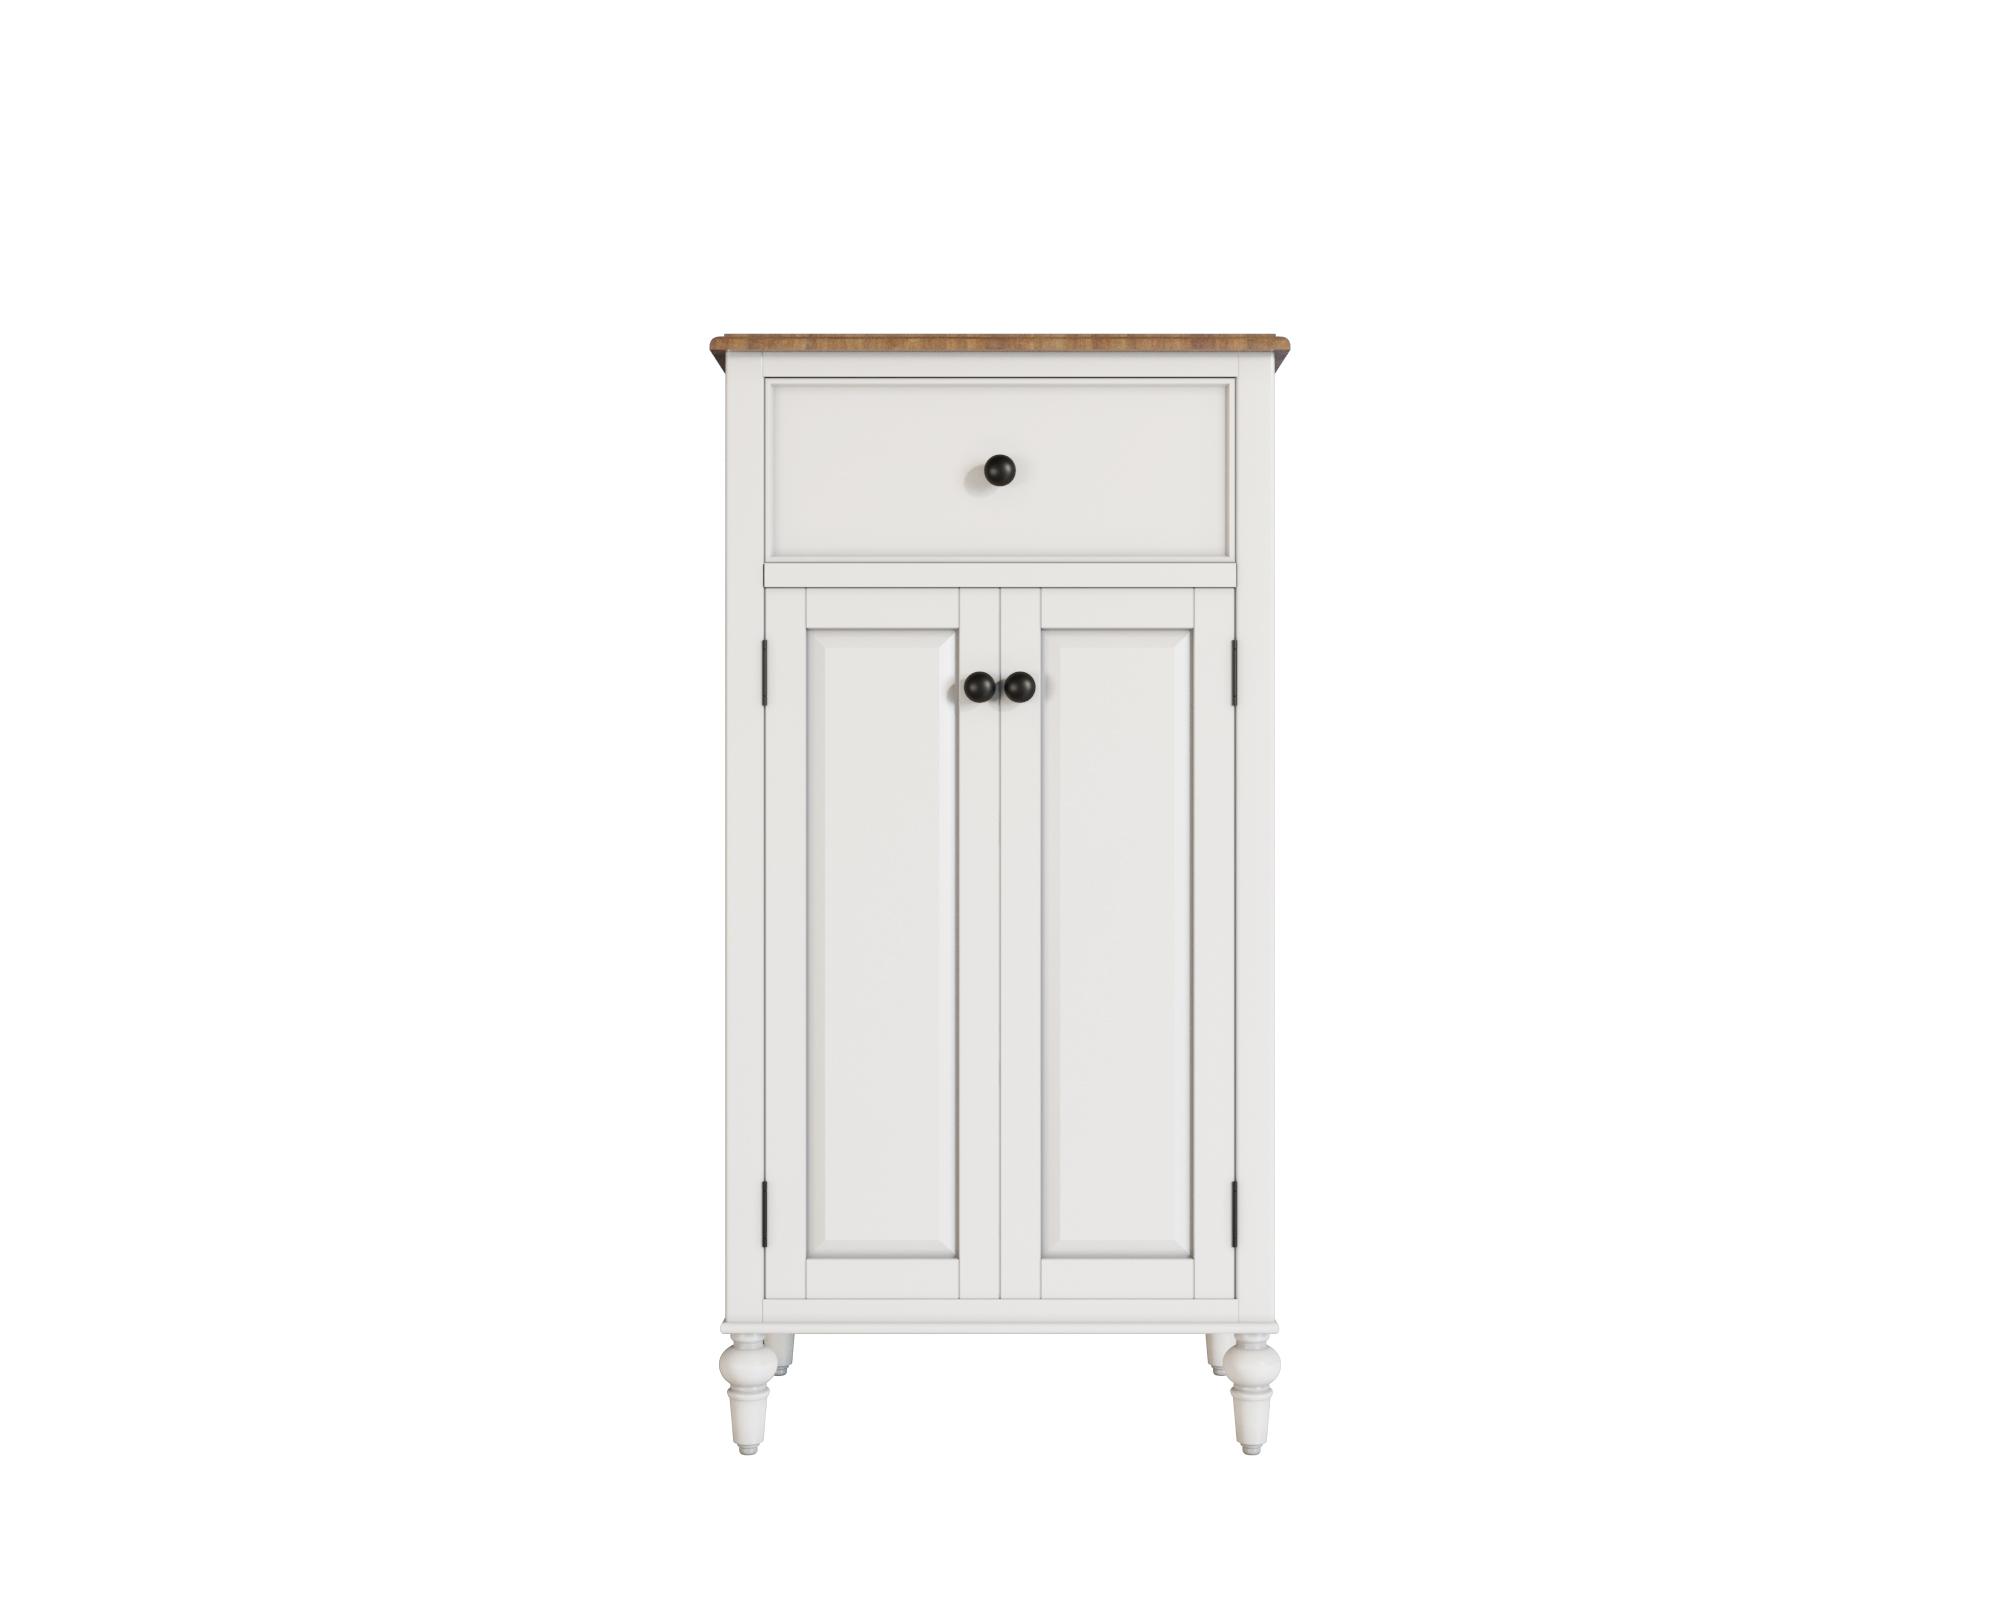 Узкий комод odri с дверками (etg-home) белый 60x120x40 см. фото